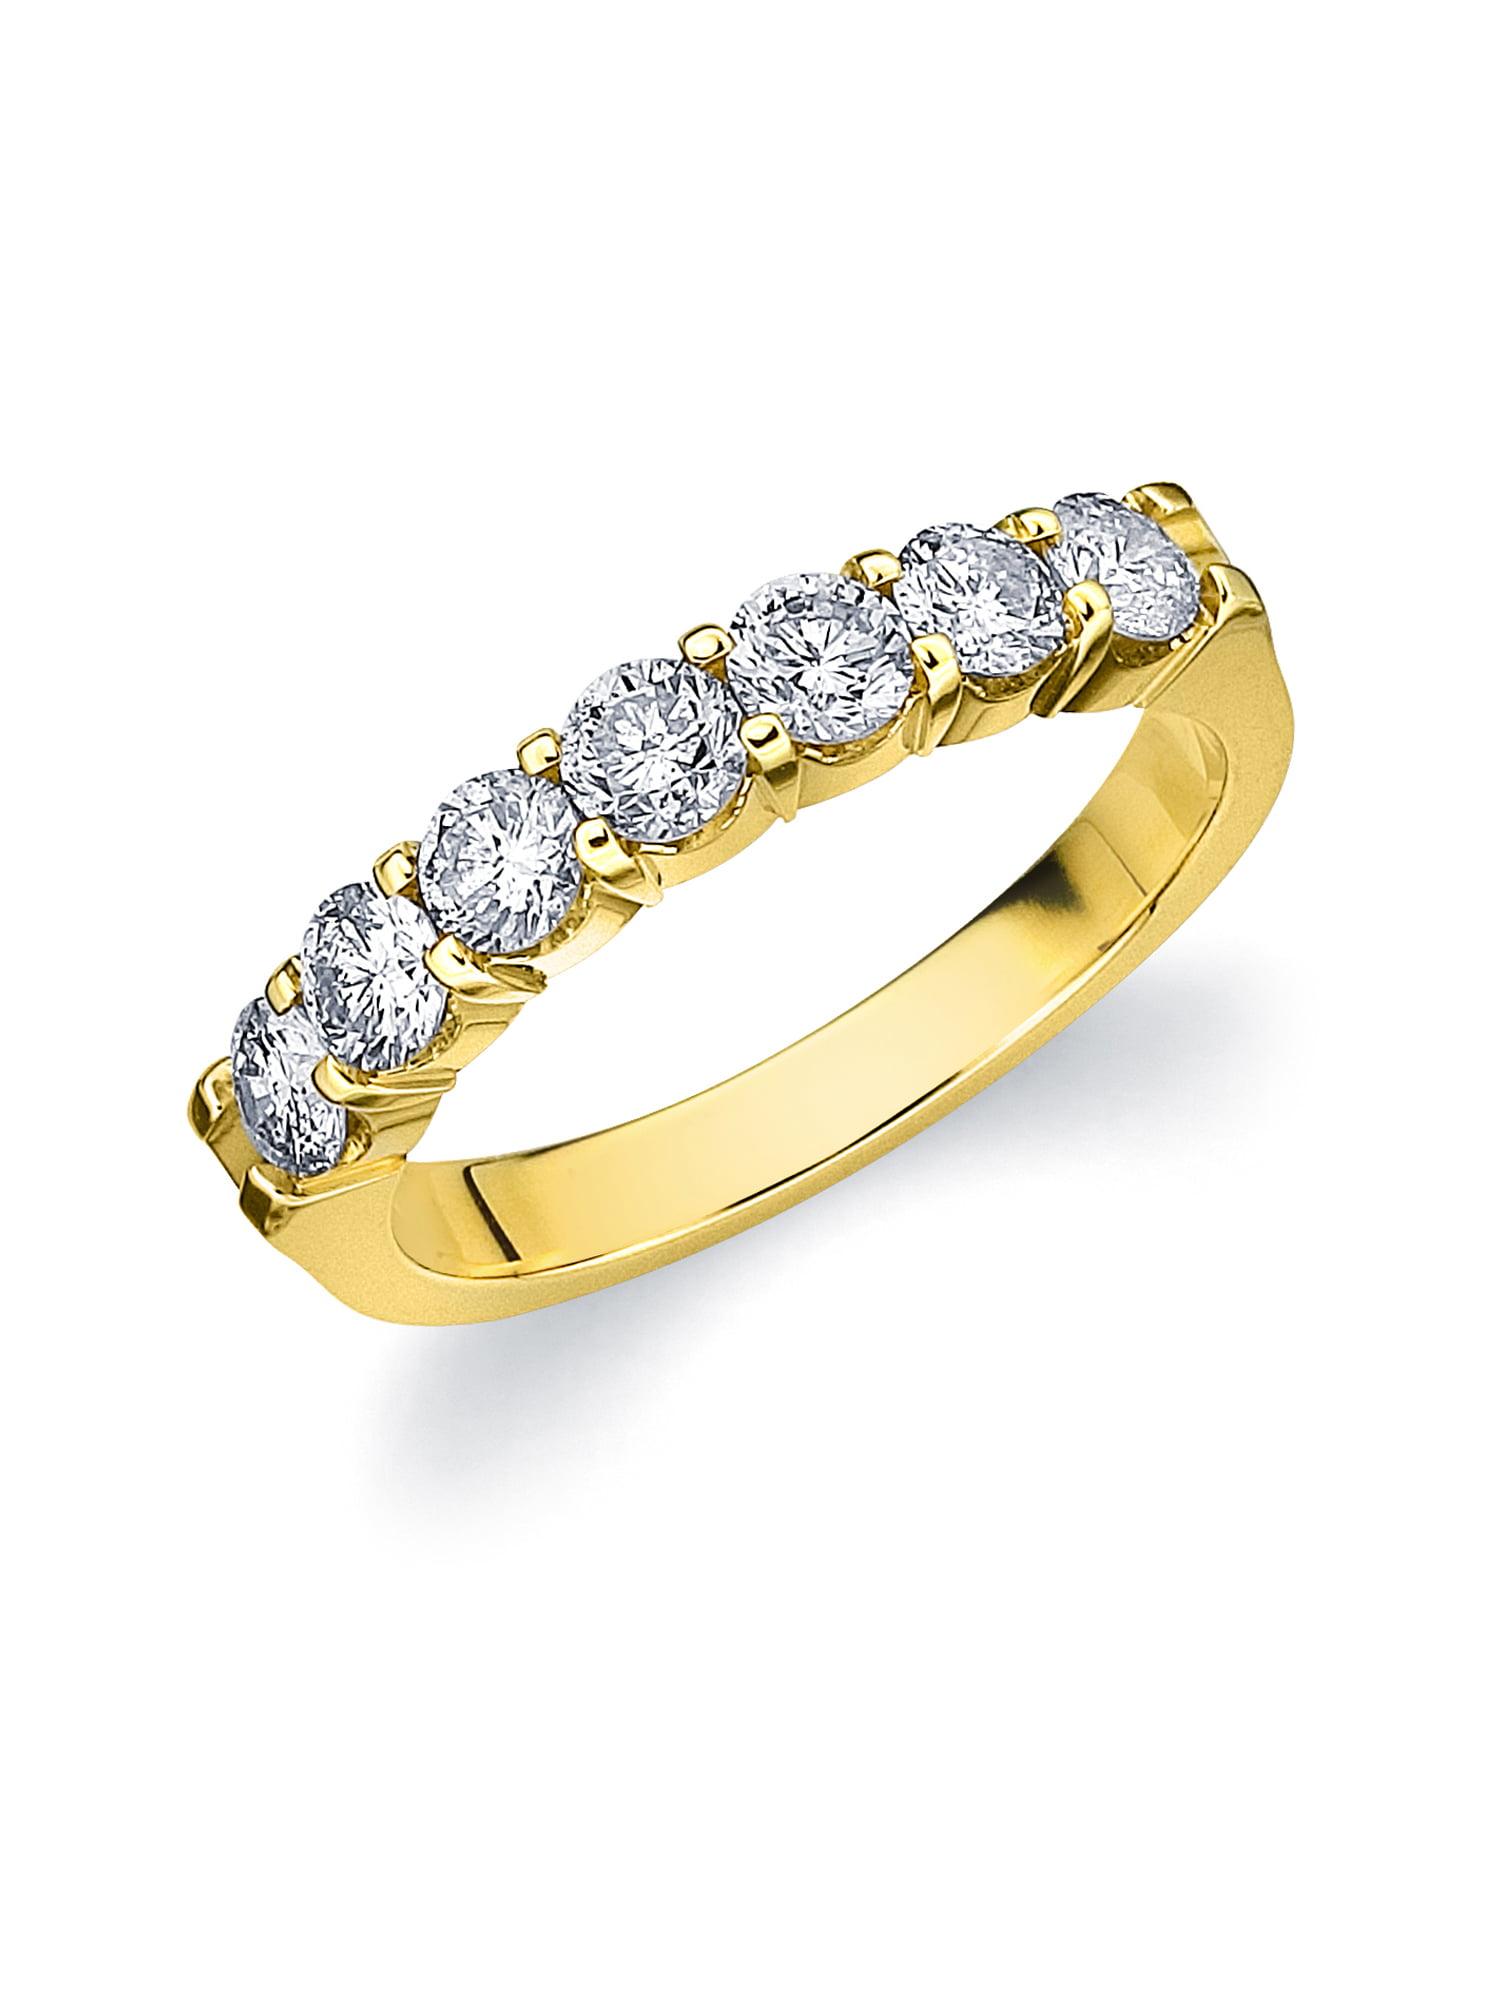 0.5 CTTW 7 Stone Yellow Gold Diamond Anniversary Ring, Diamond Wedding Band by